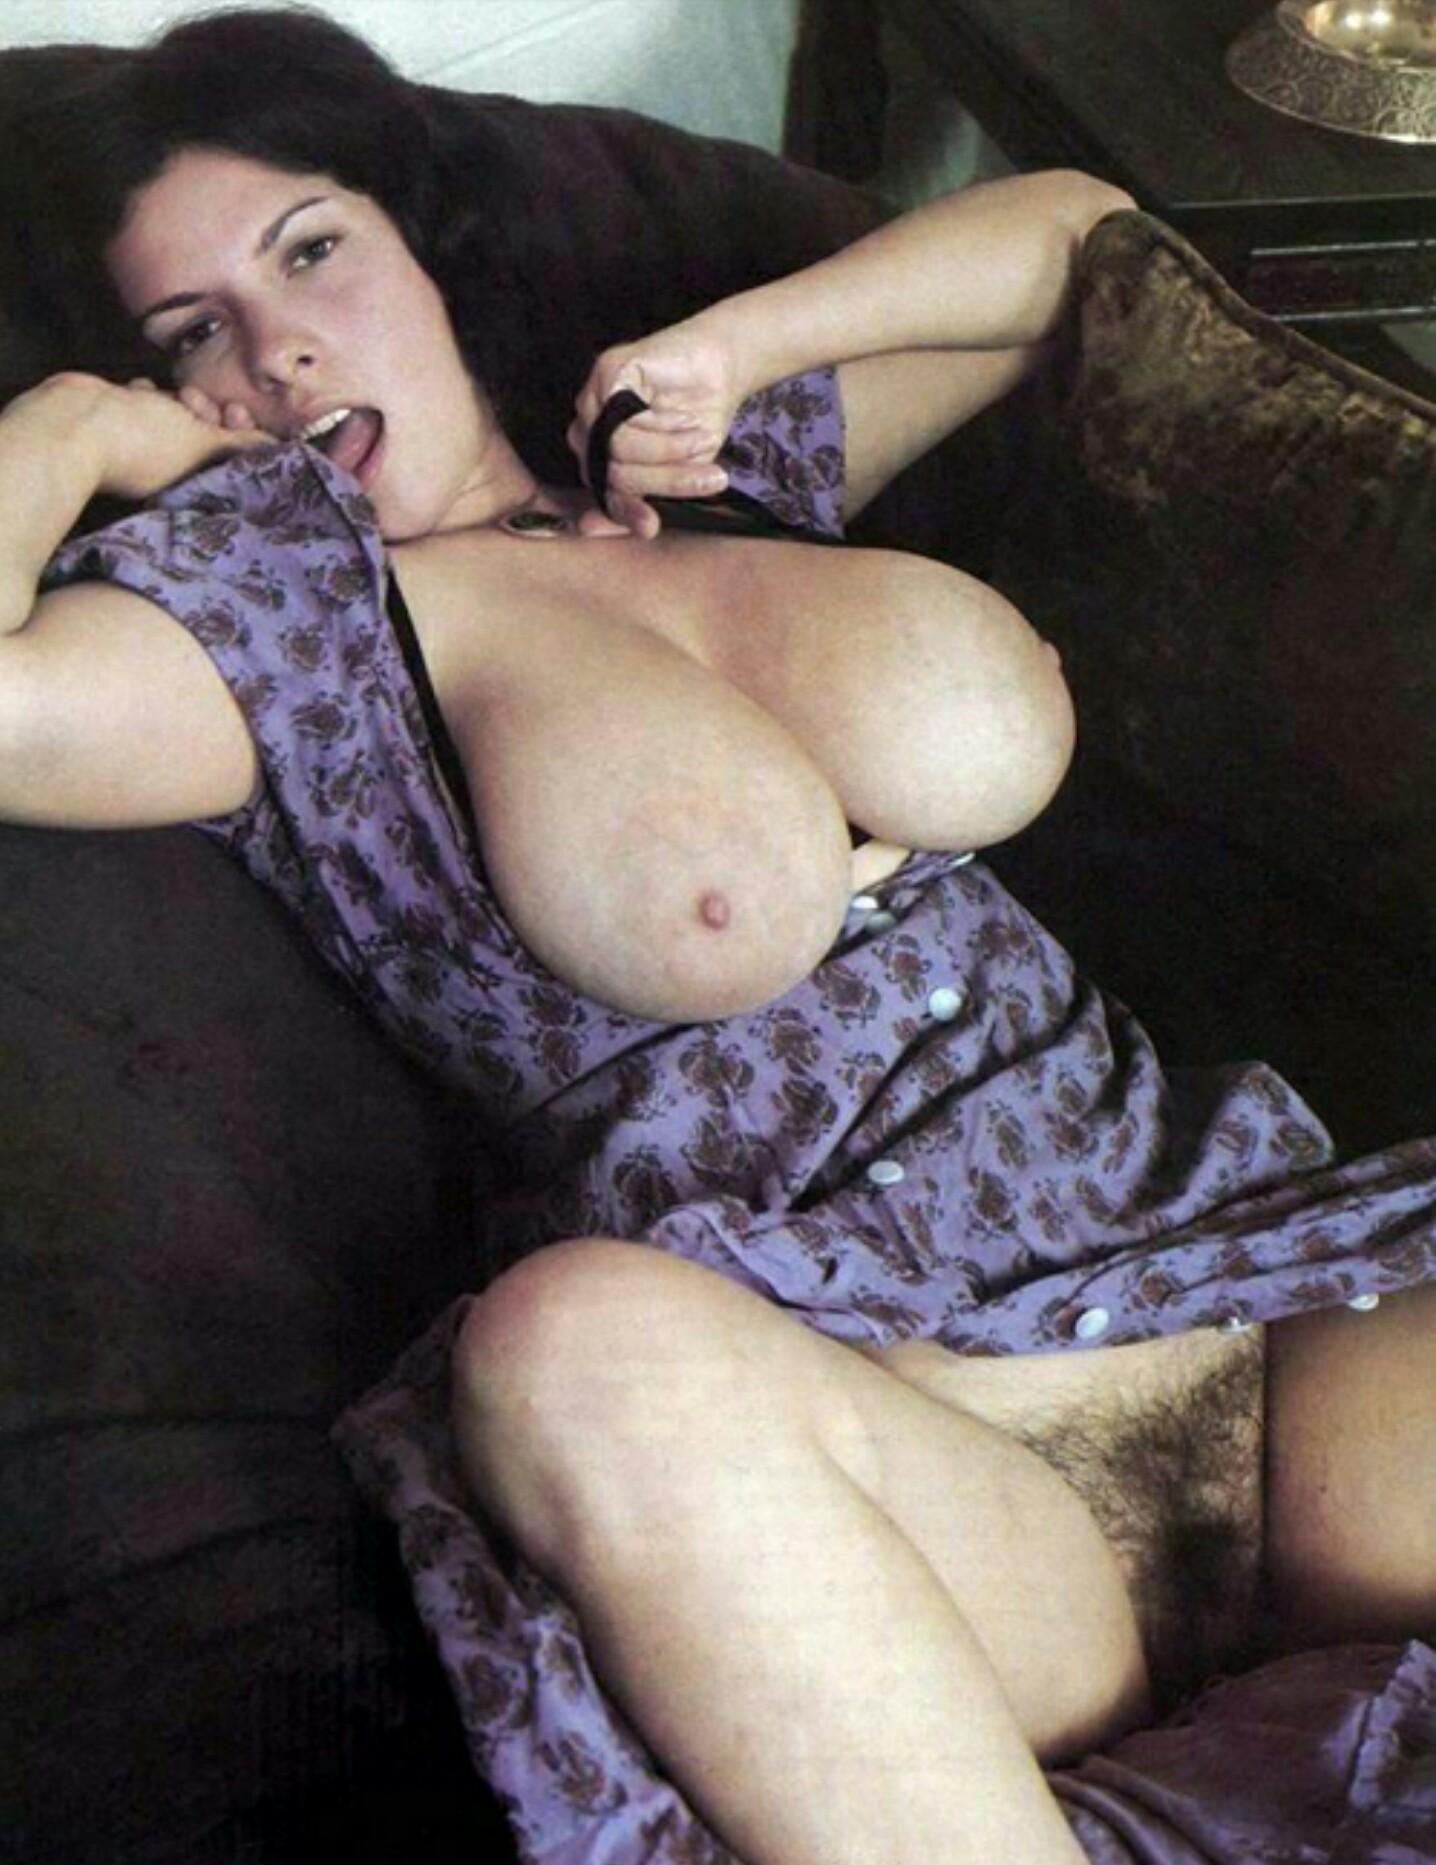 Nude carribian women pic hardcore photos